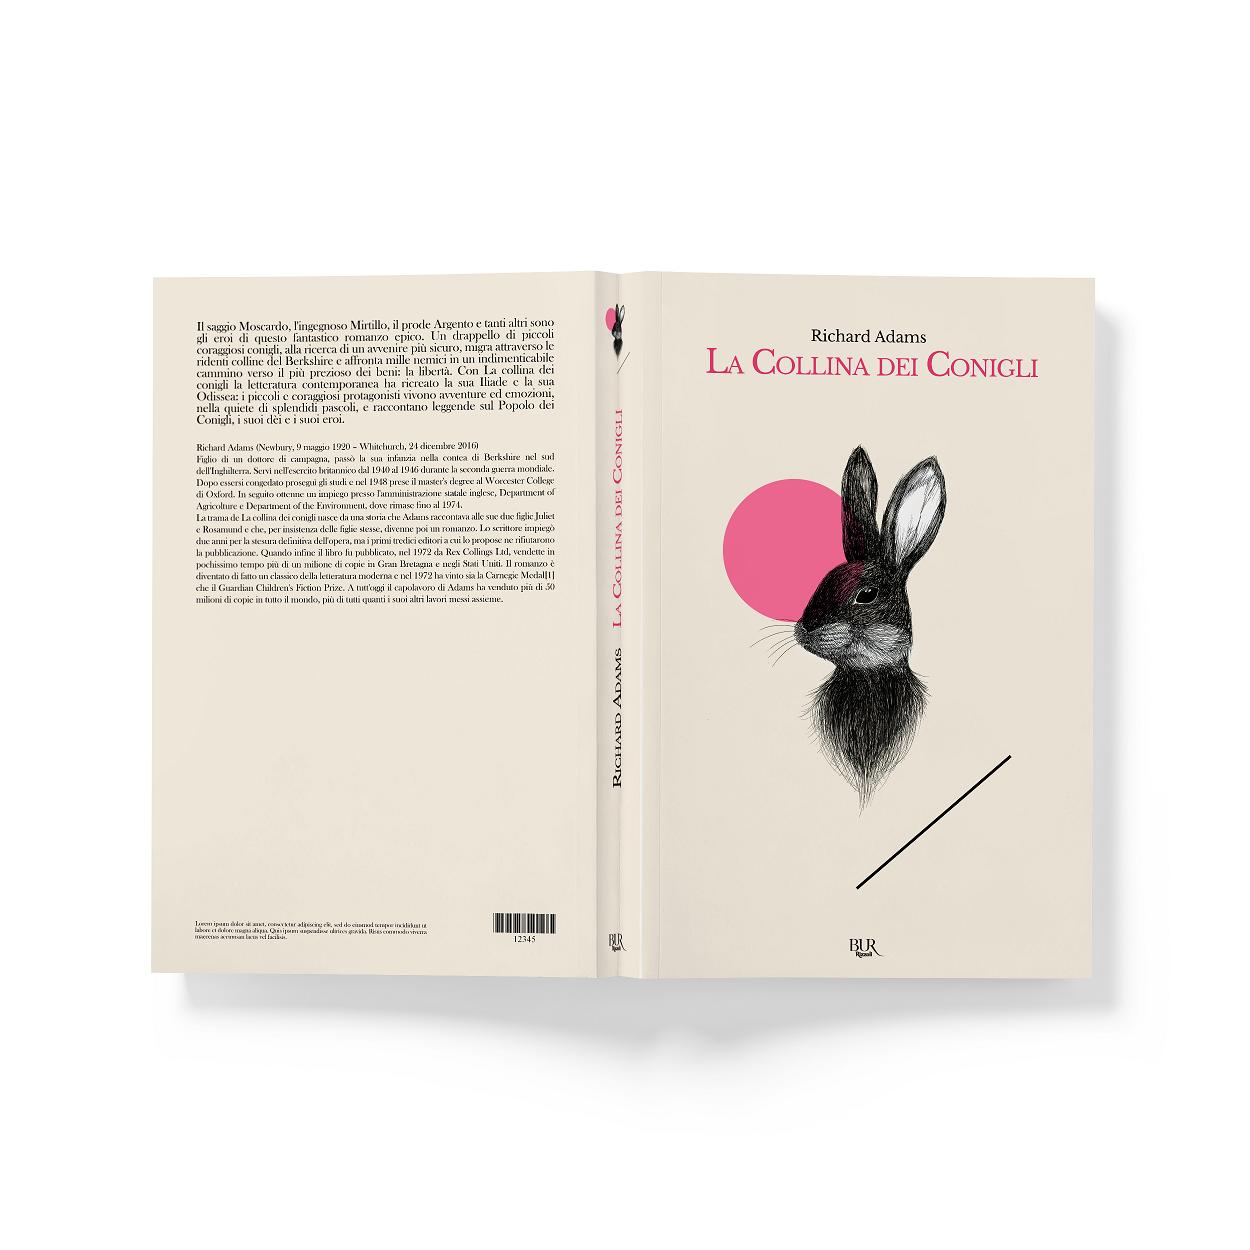 mulas-chiara-illustration-watership-down-collina-dei-conigli-richard-adams-netflix-chimù-illustration-cover (2)